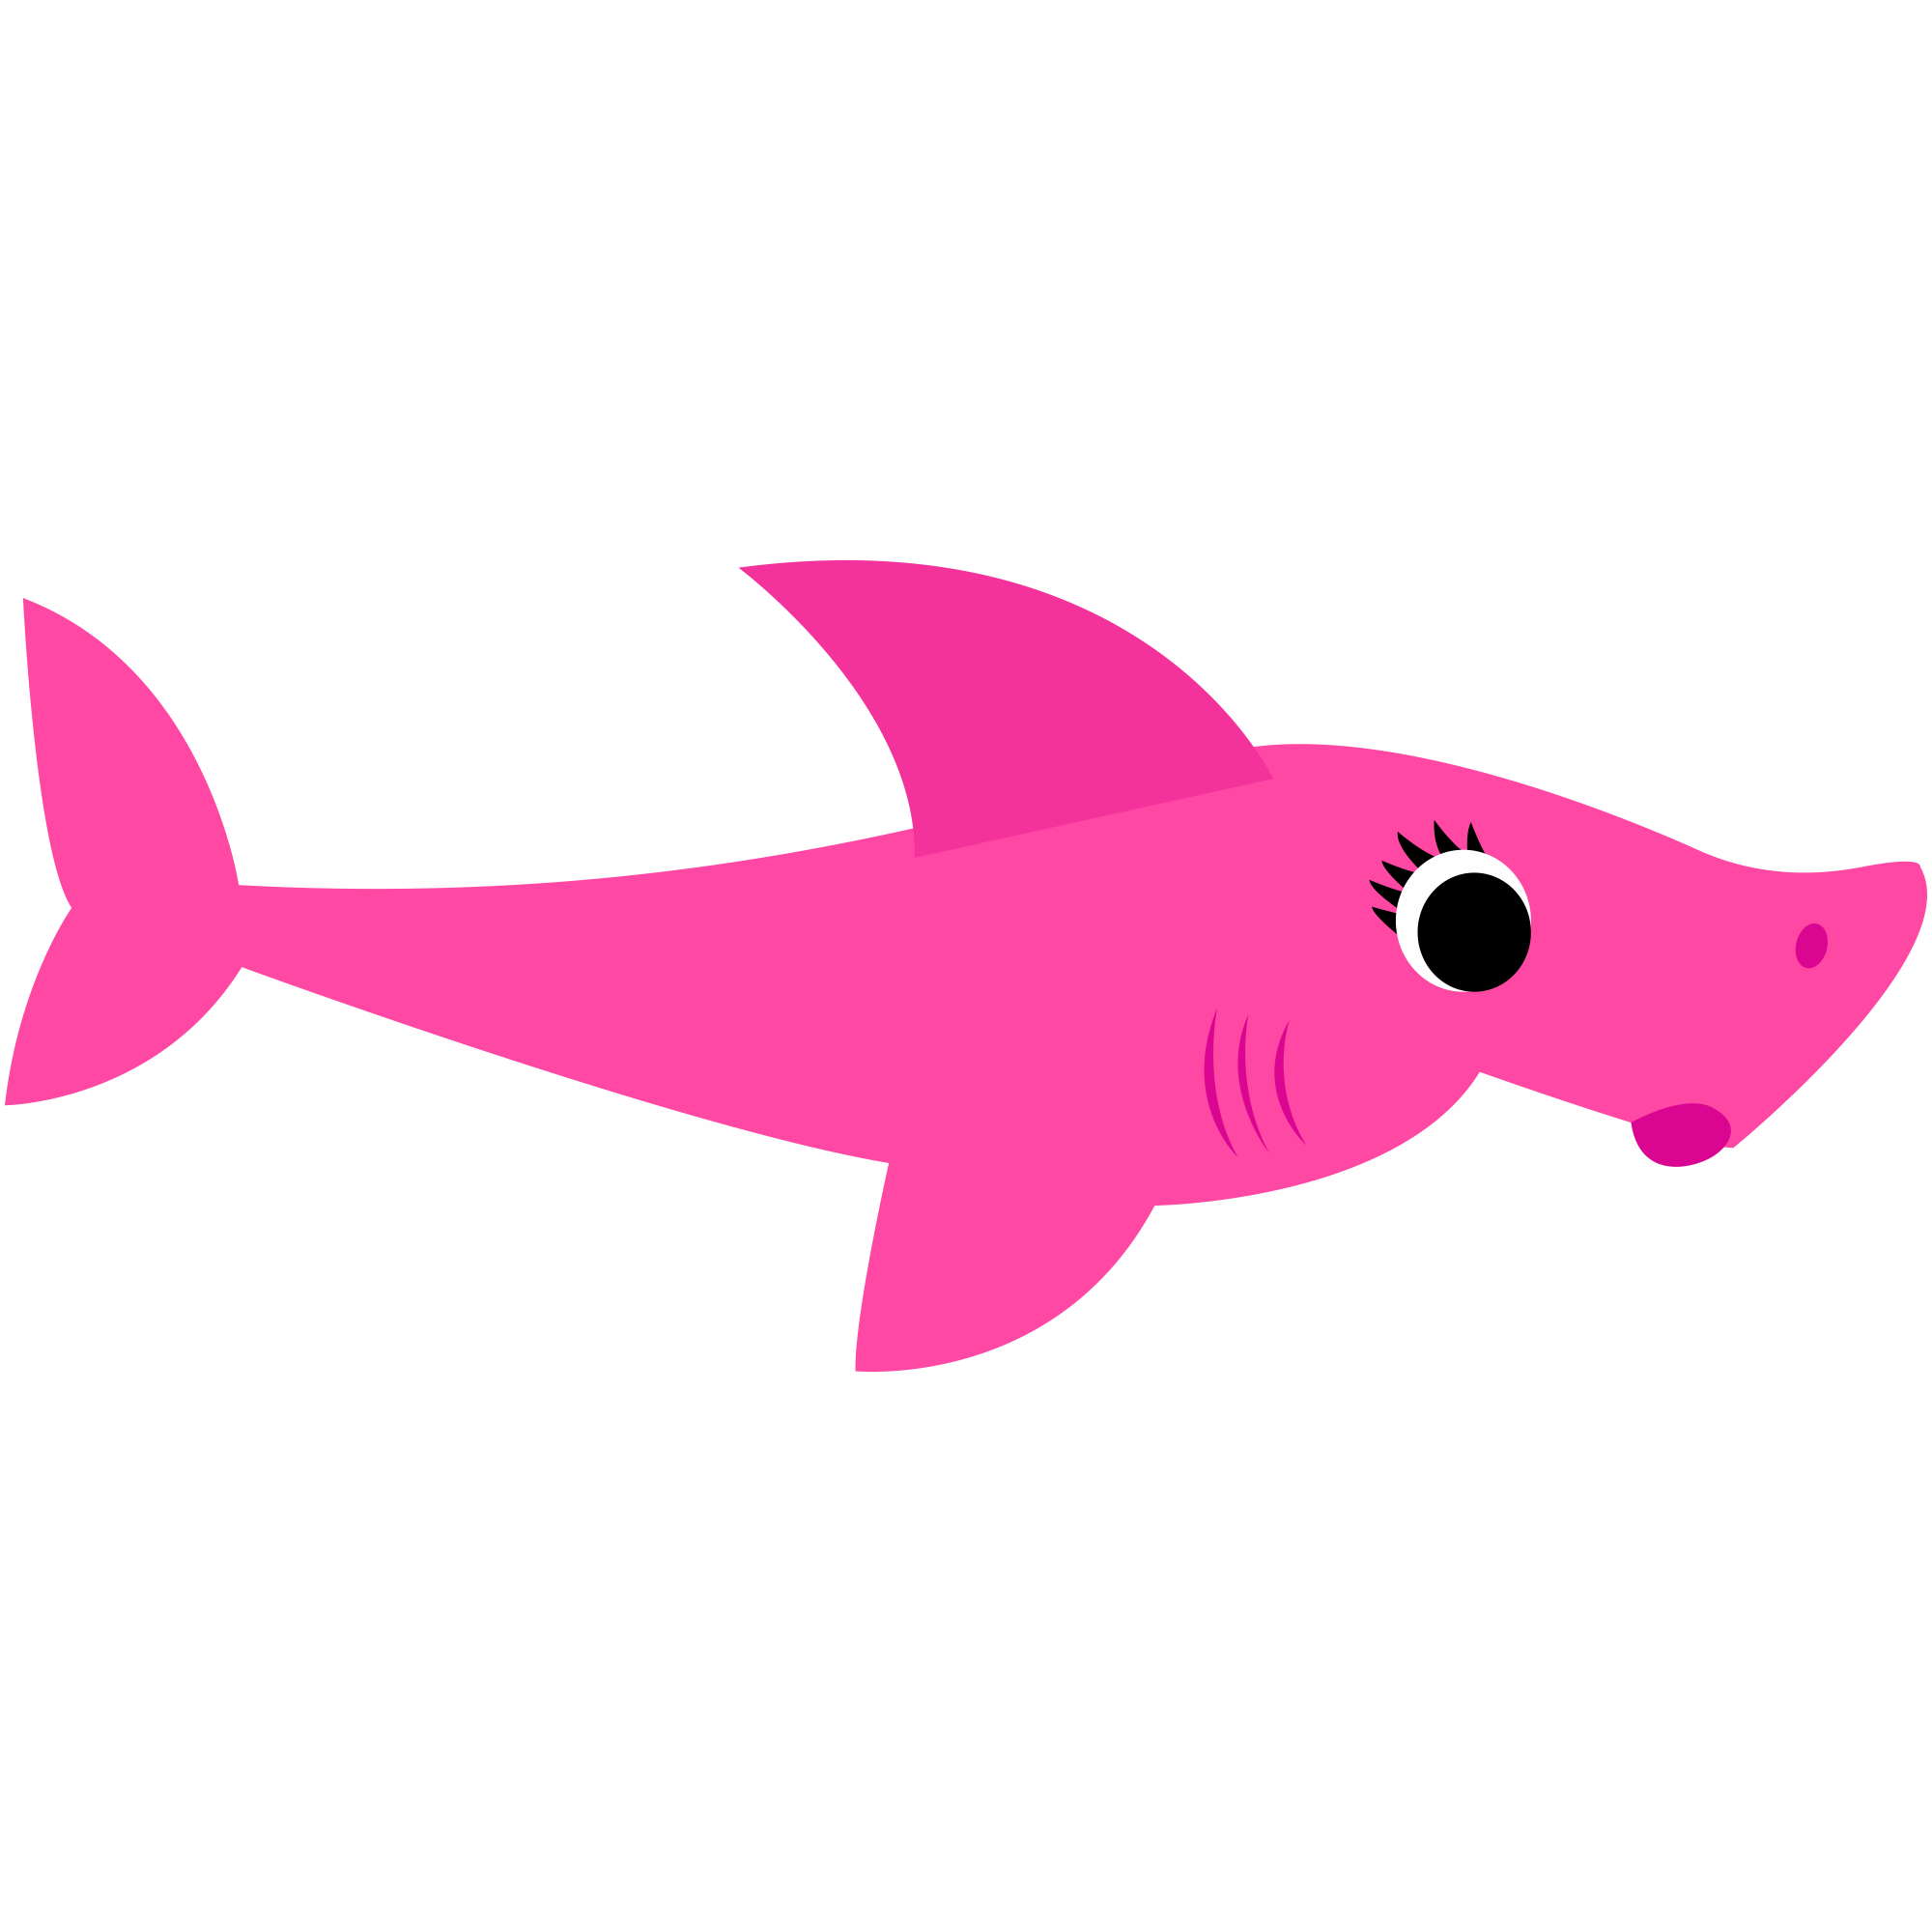 Mommny Shark PNG, Mutterhai, tiburón mamá, mamãe tubarão